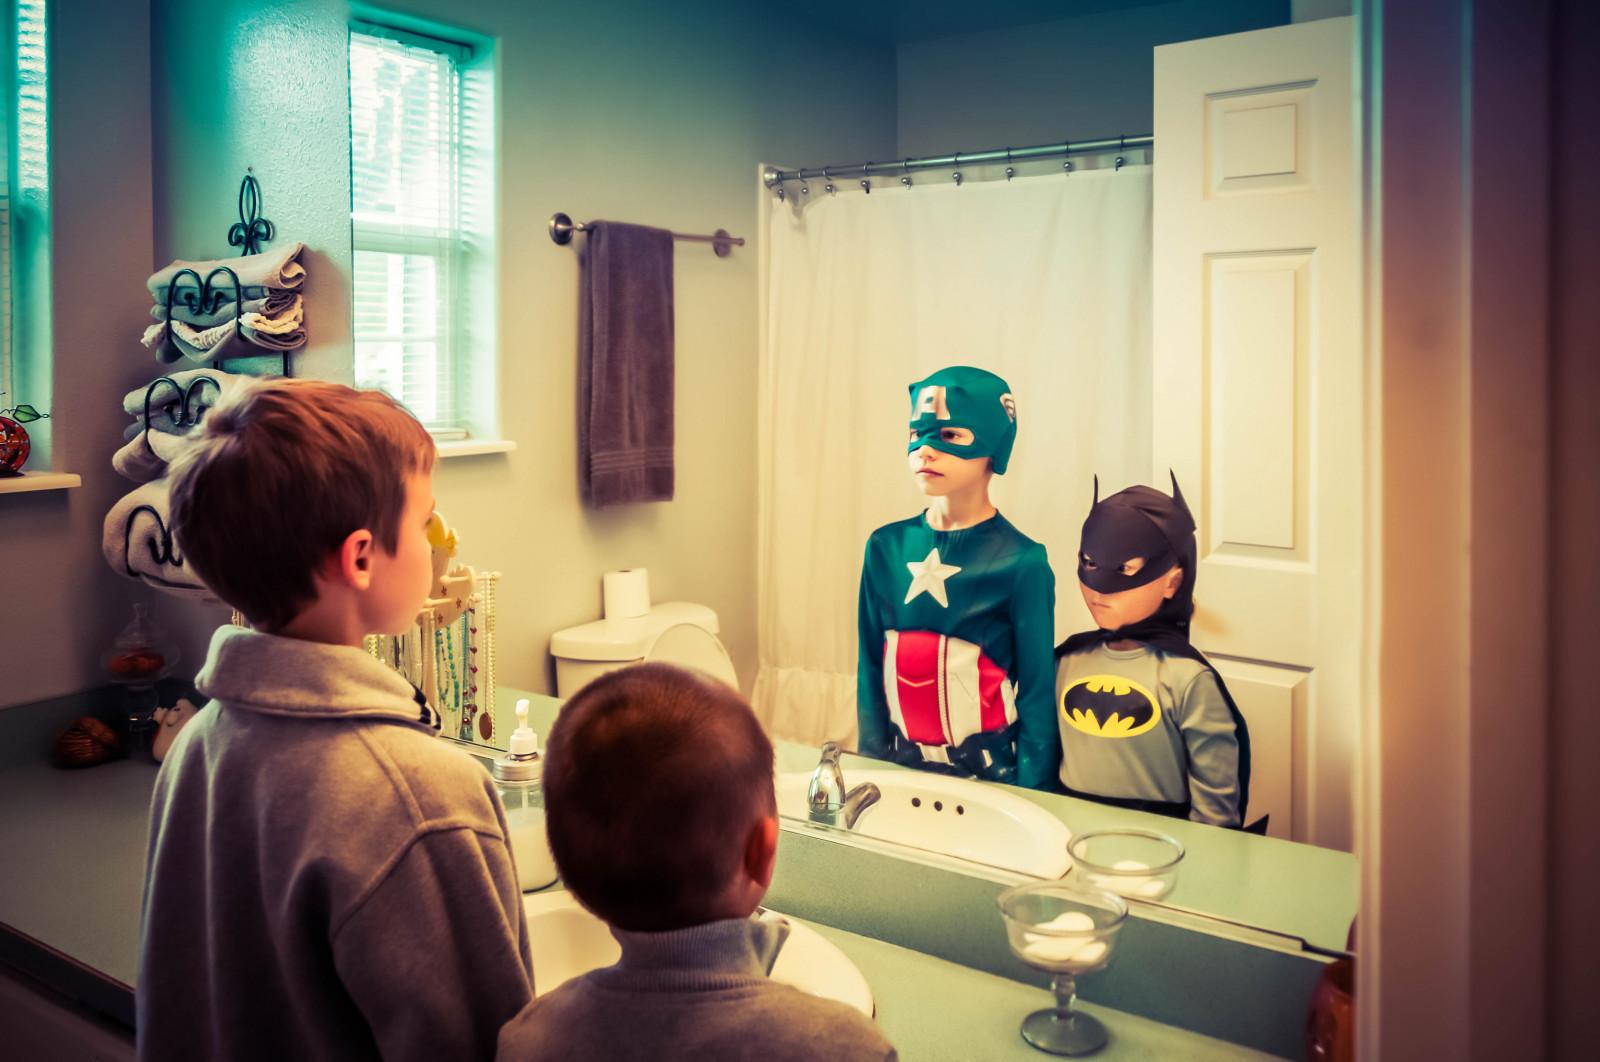 room reflection Batman mirror superhero technology world Nikon imagination comics bathroom captain sink DC america girl fun flickrfriday make wish 18200mm d90 dccomics vr marvel a captainamerica rules electronic device marvelcomics makeawish vr18200mm imaginationrulestheworld